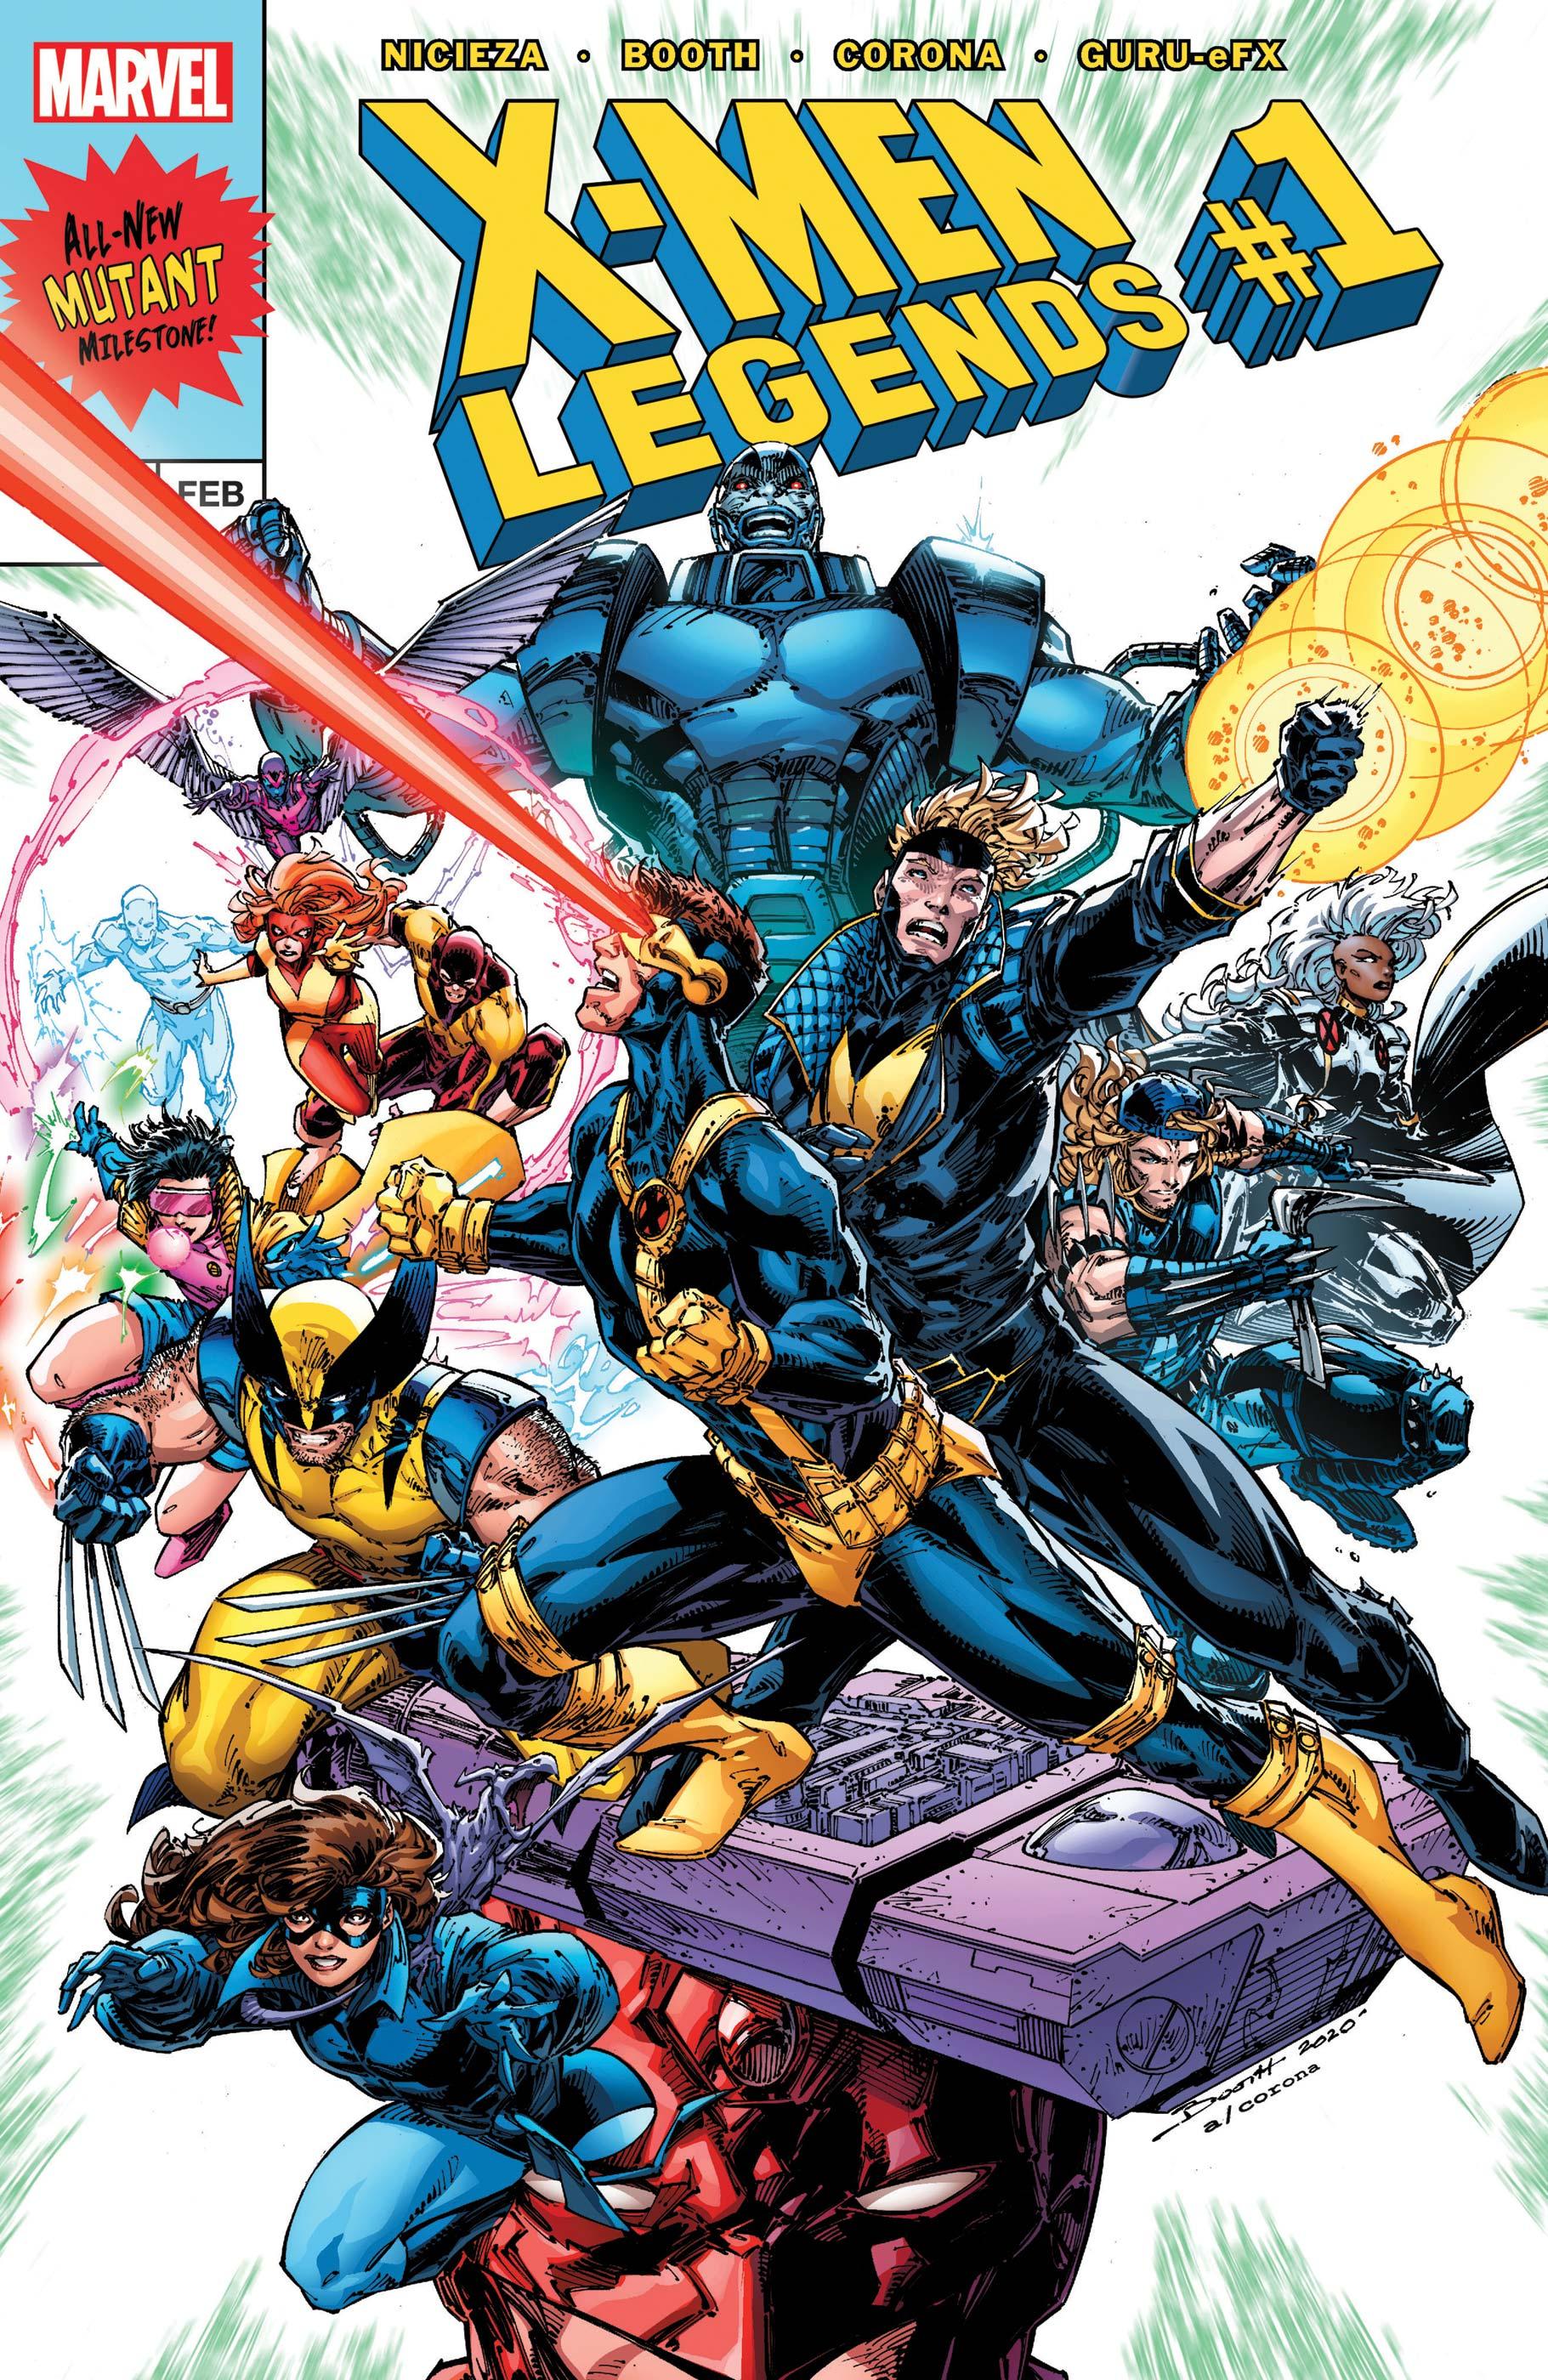 X-Men Legends (2021) #1